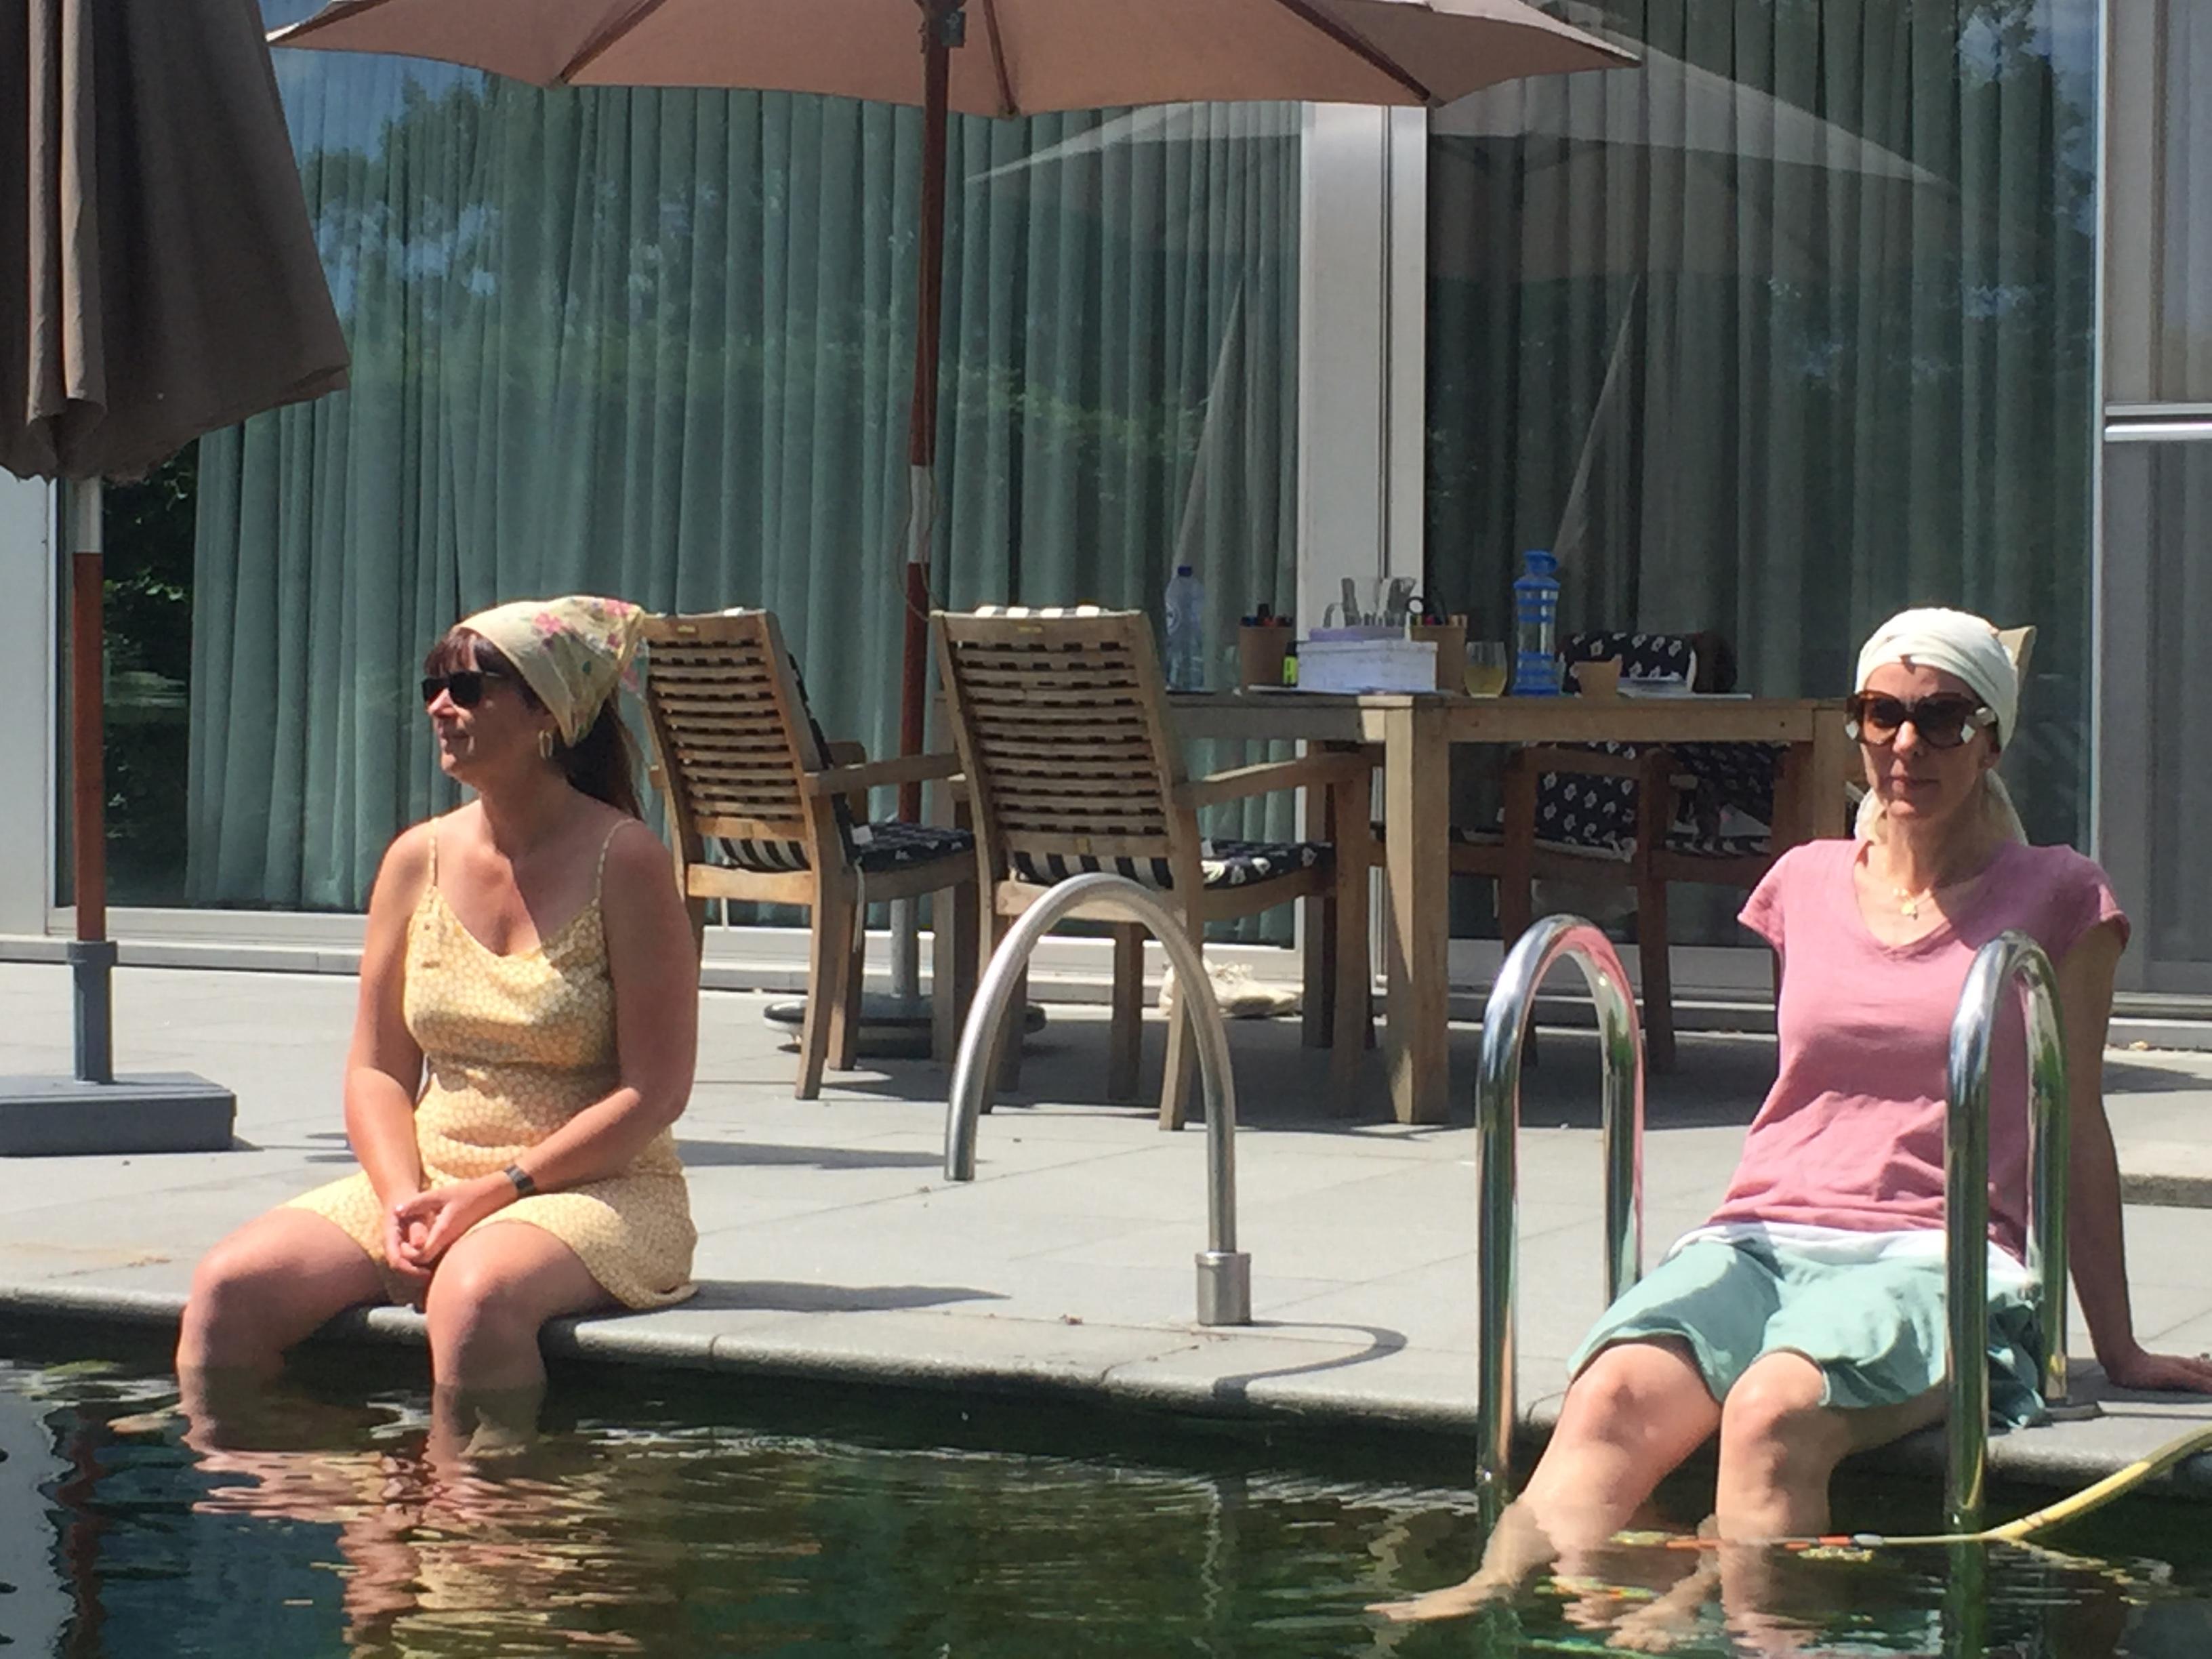 stress de baas zomers genieten pauze in de zon